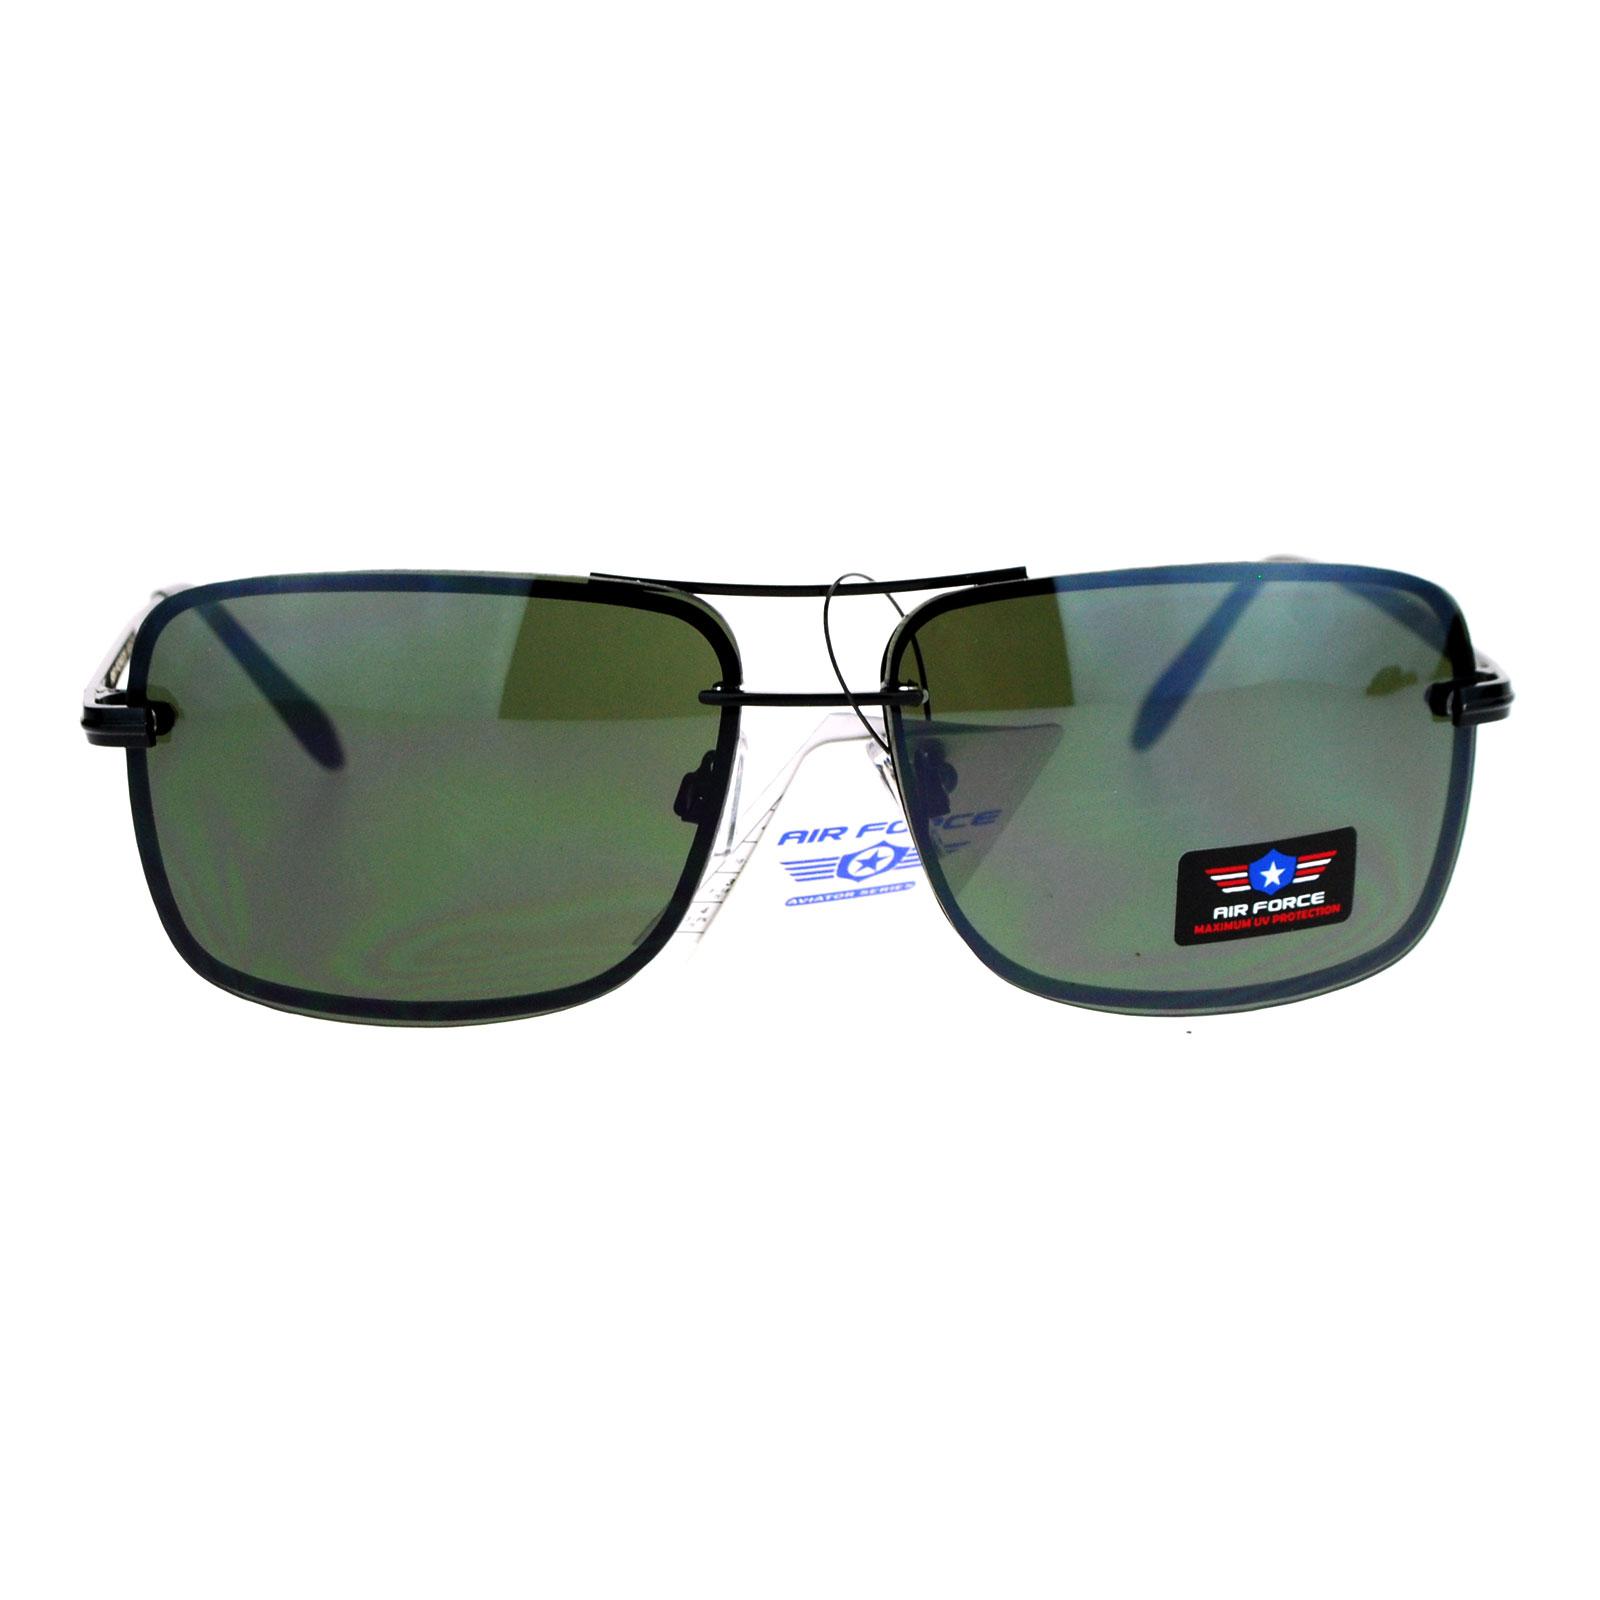 b52ebfea7c SA106 Air Force Rimless Rectangular Aviator Sunglasses